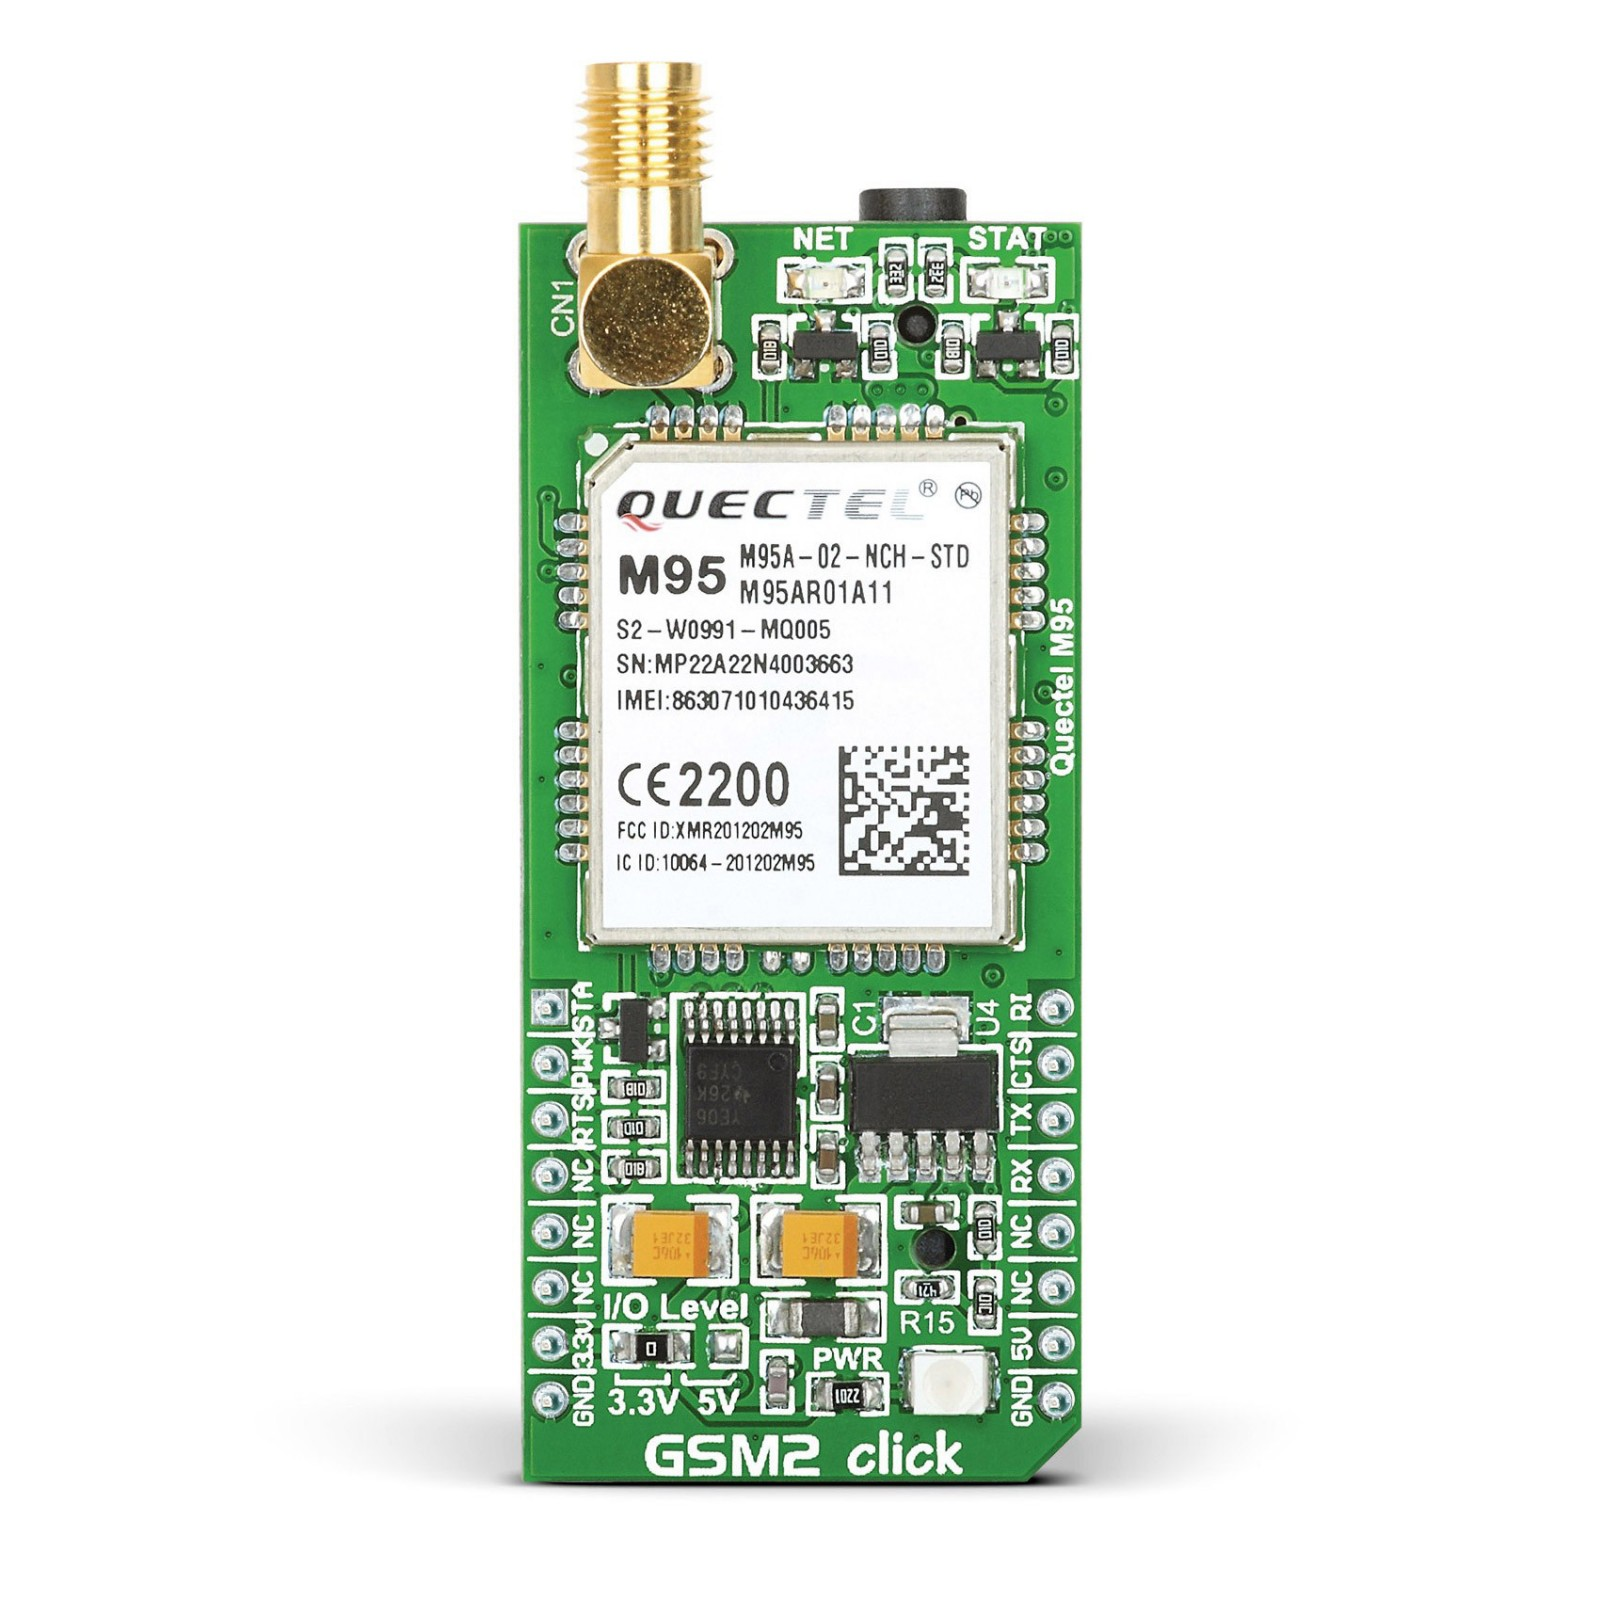 Gsm2 Click Board In Mikrobus Form Factor That Features Quectel M95 Magic Jack Wiring Diagram Mgctlbxnmzp Mgctlbxv5112 Mgctlbxlc Mgctlbxpprestashop